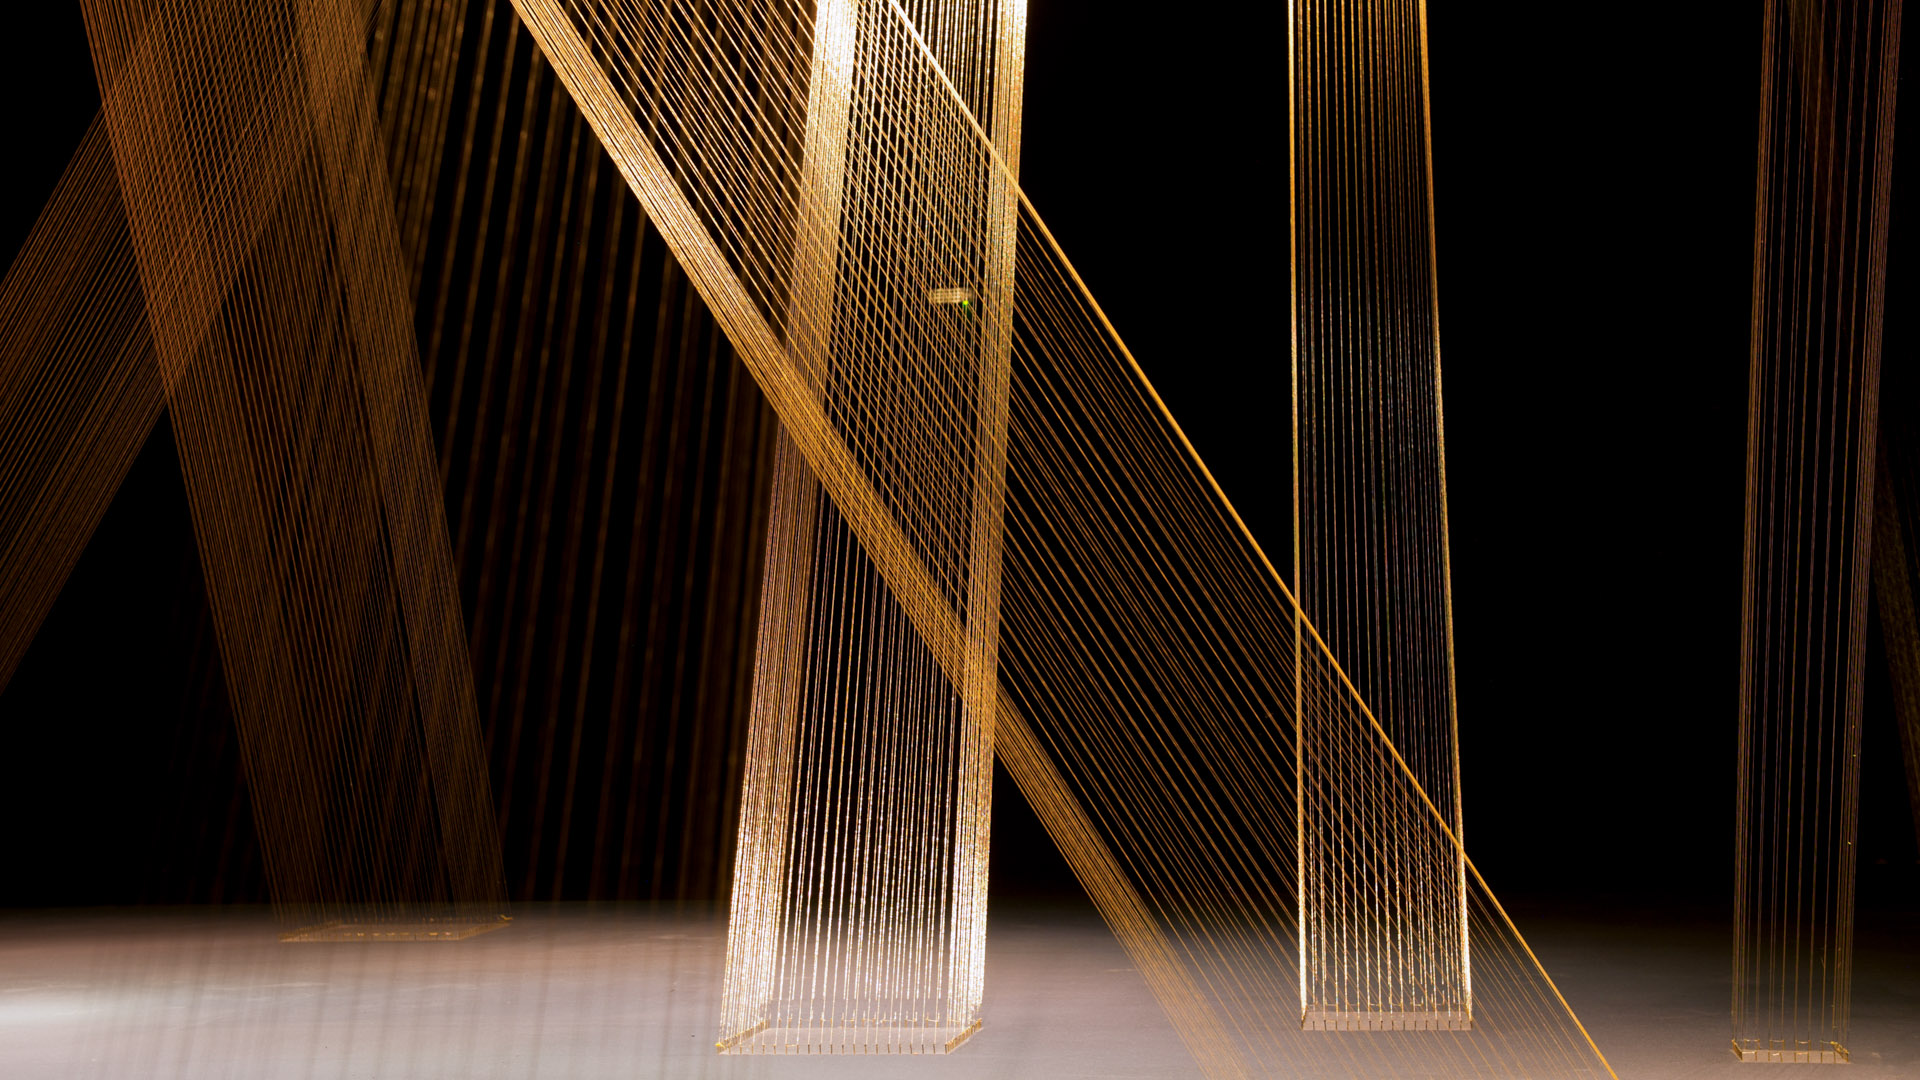 Obra Ttéia 1 C, 2002, de Lygia Pape. Acervo de arte contemporânea do Inhotim